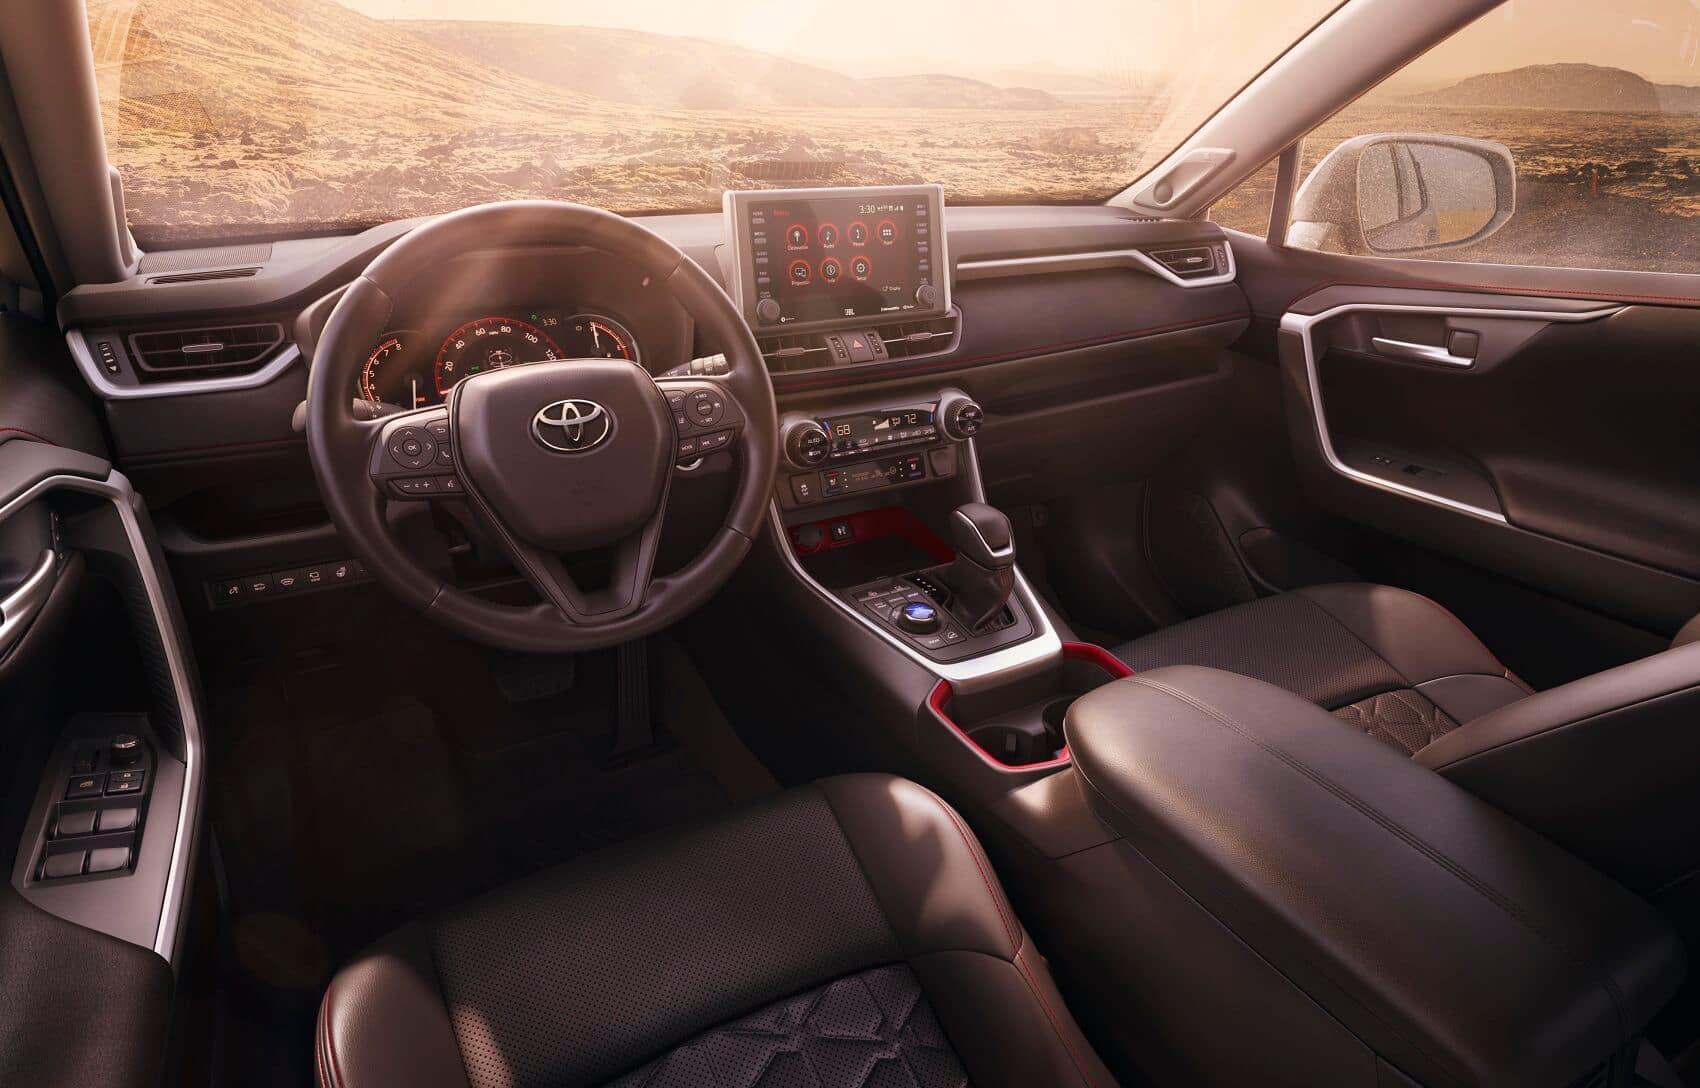 Toyota RAV4 Interior Style